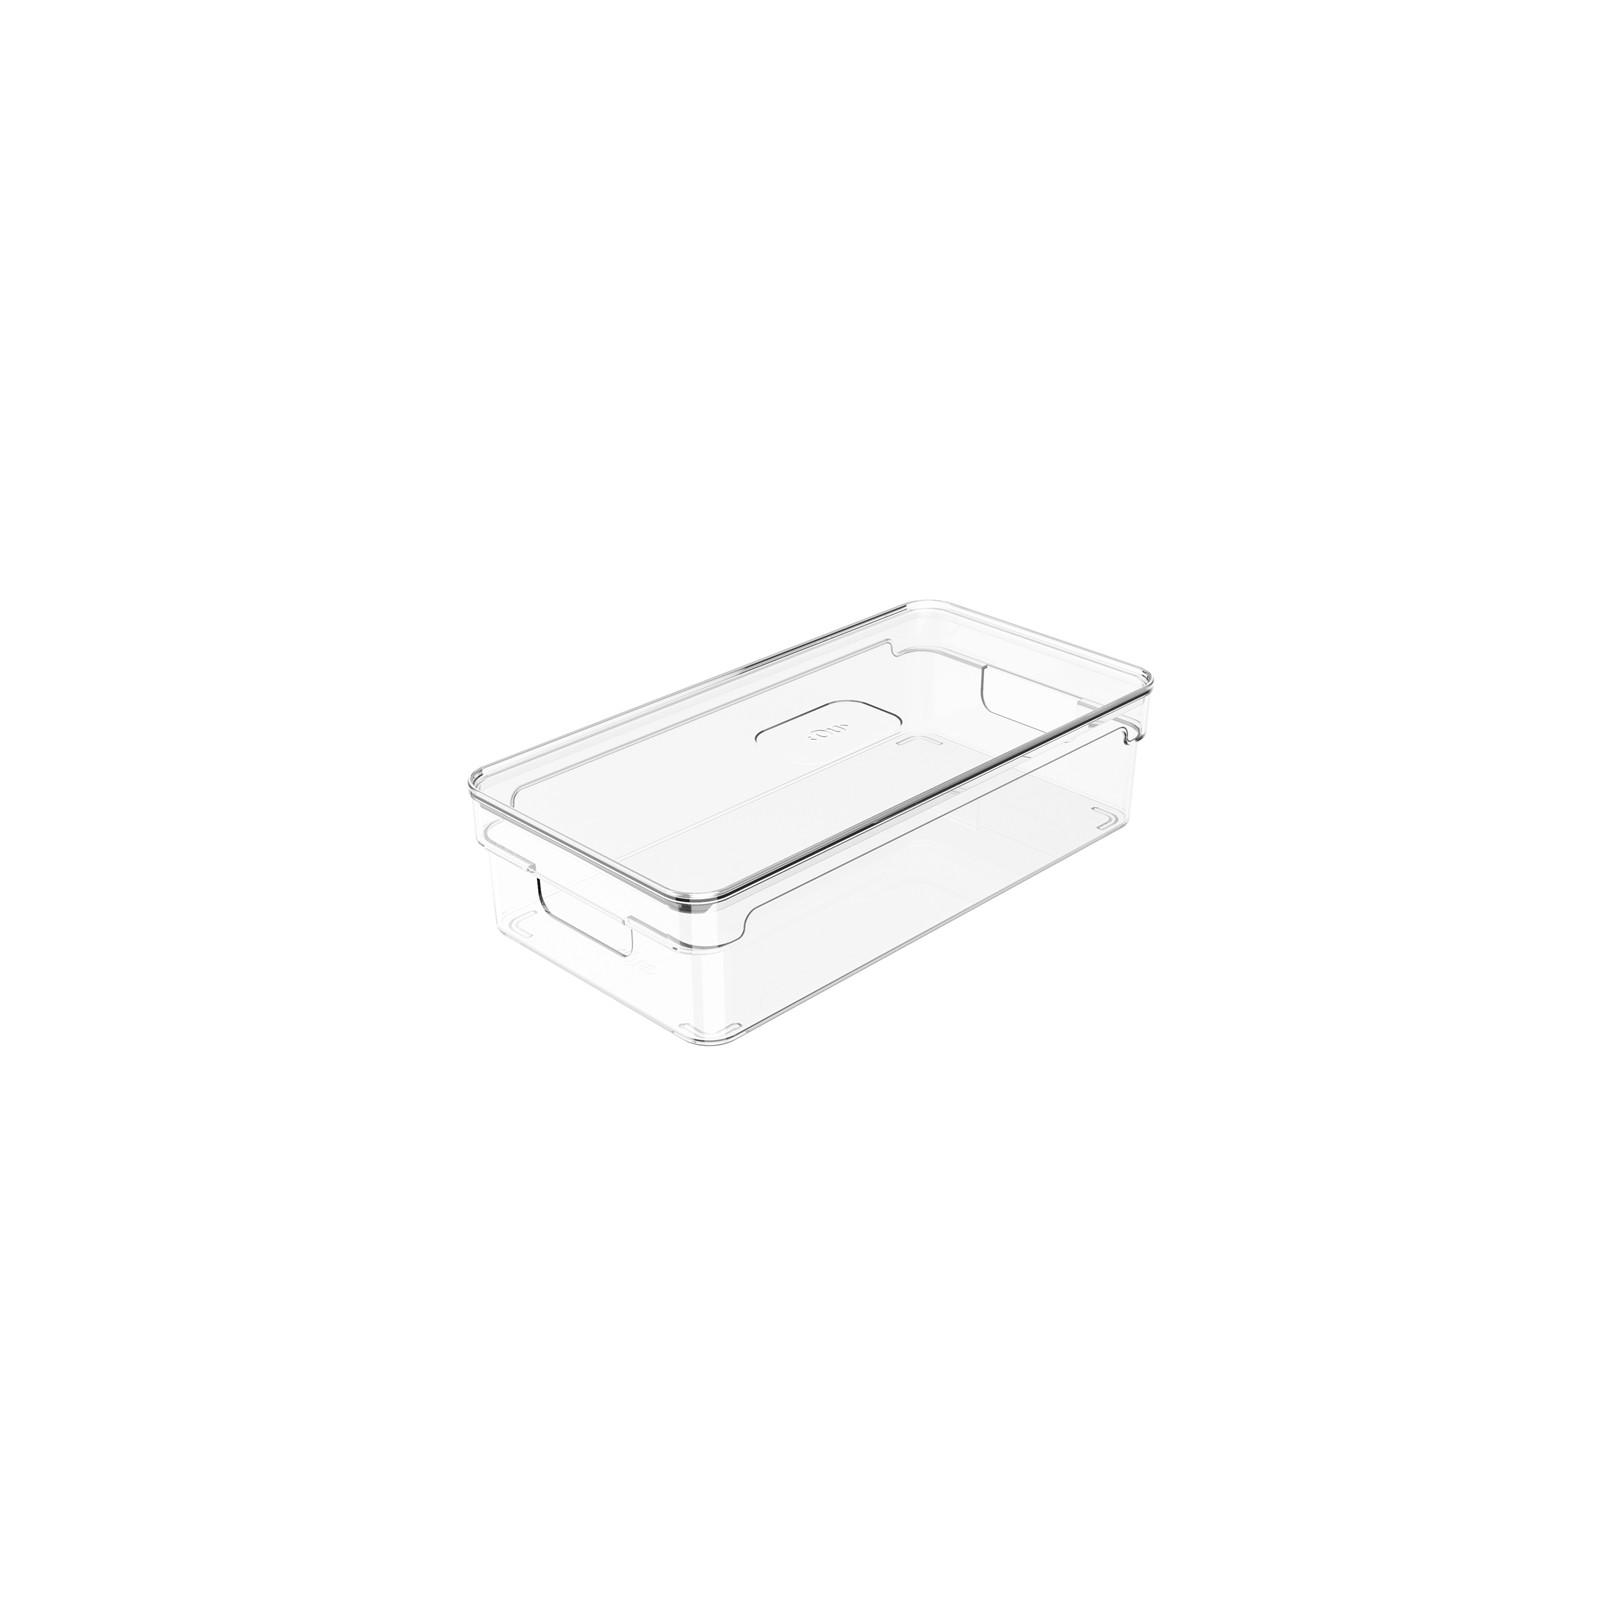 Organizador Clear com tampa 30x15x7cm Natural - Ou